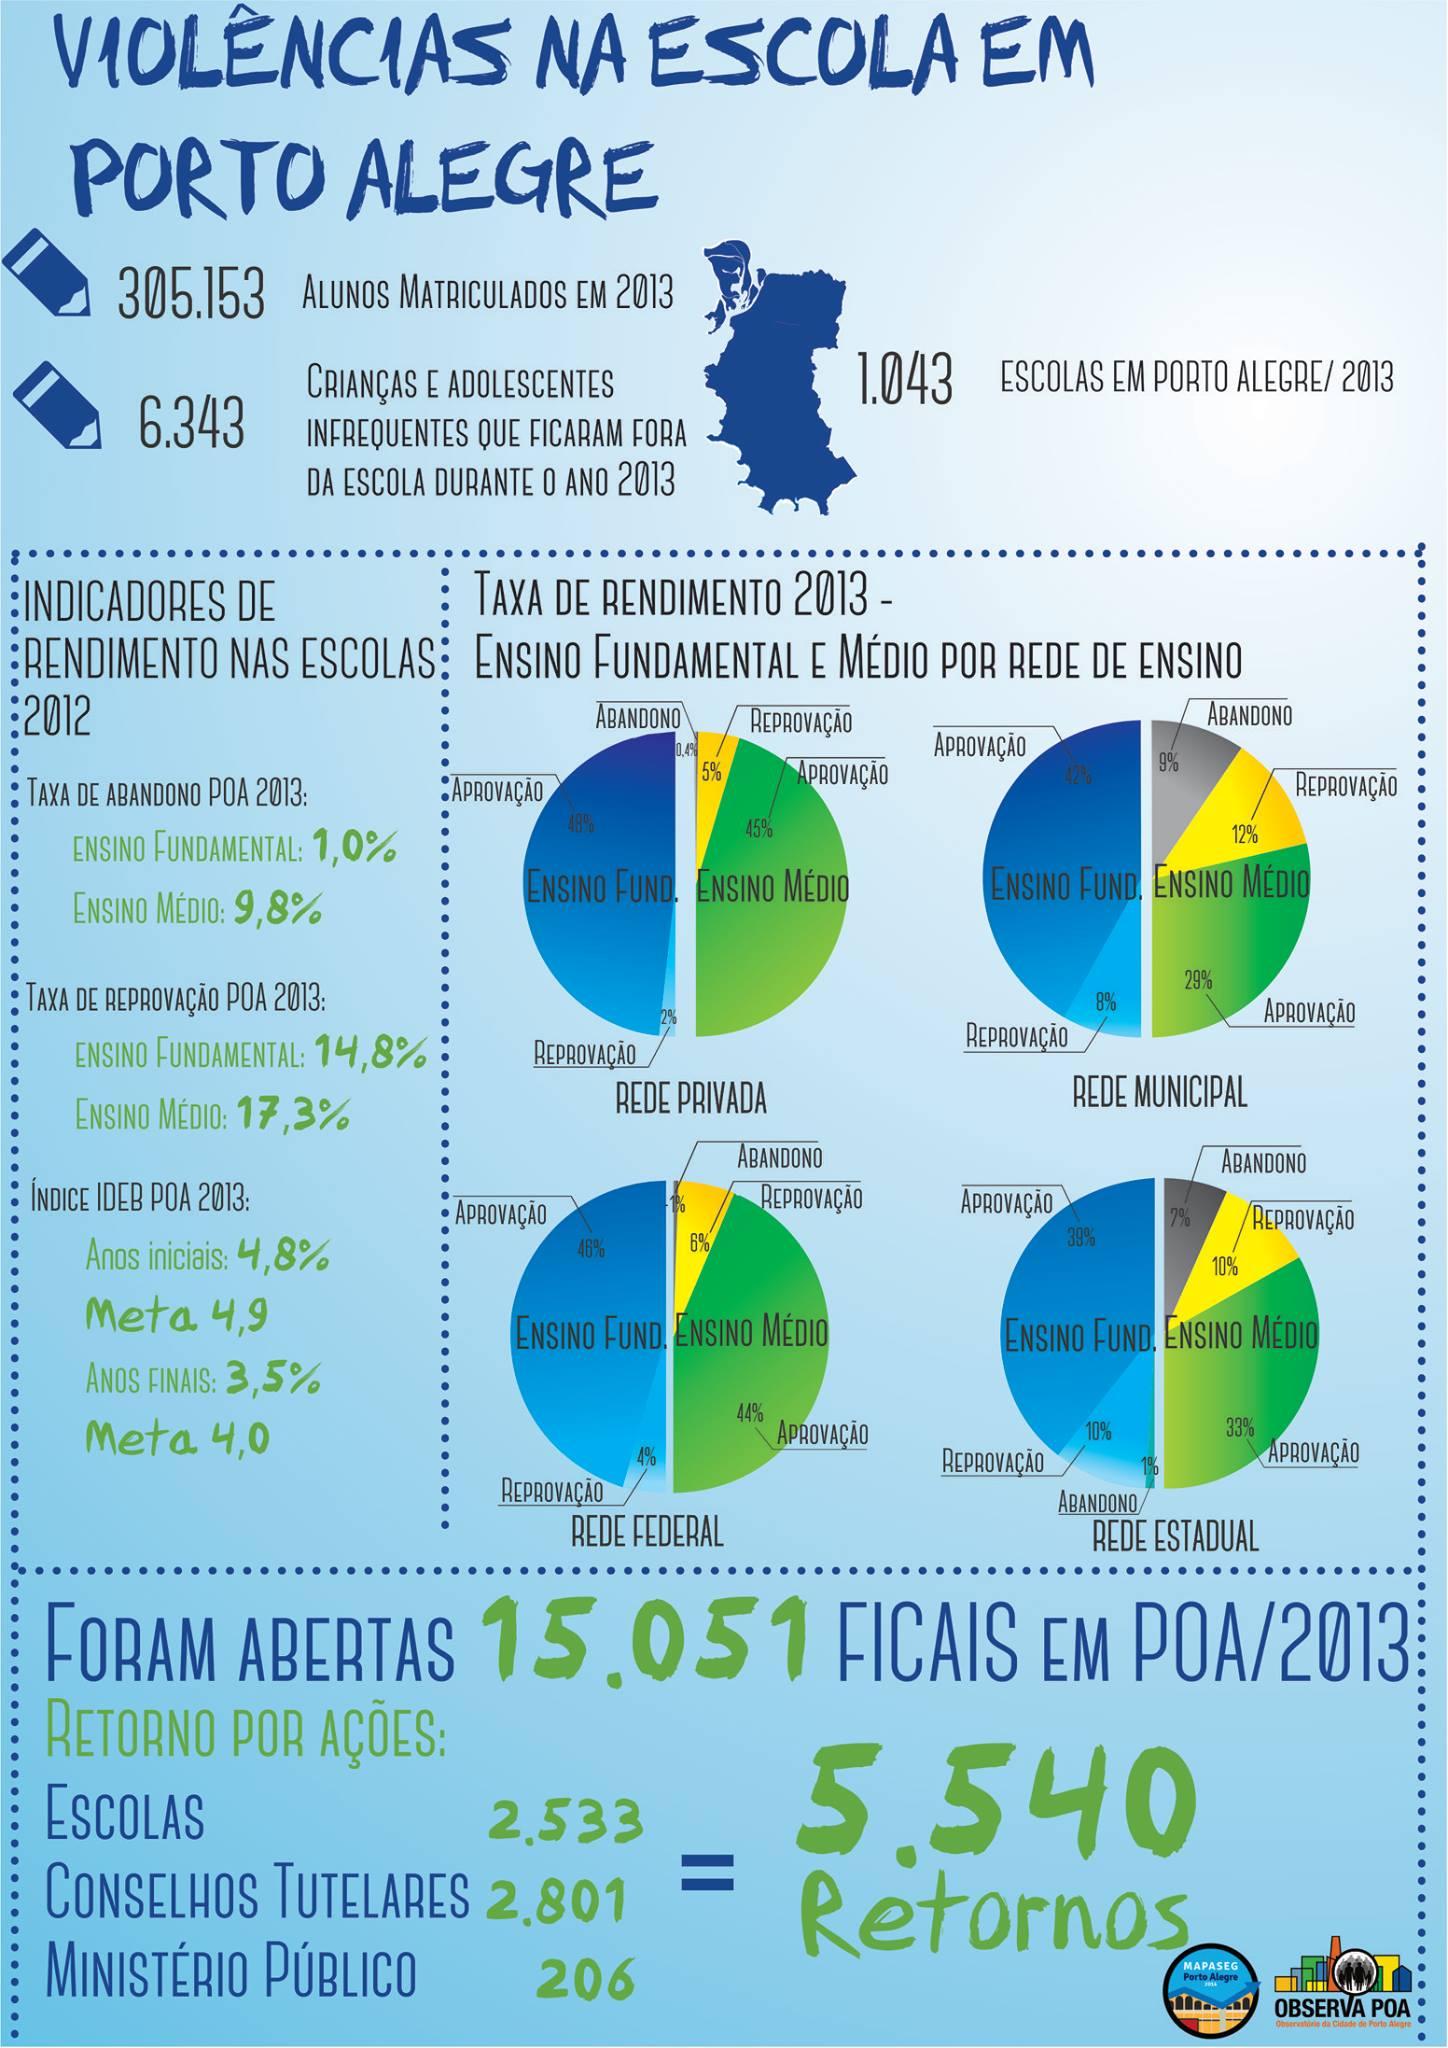 Infográfico sobre os principais tipos de violência ocorridos nas escola de Porto Alegre.